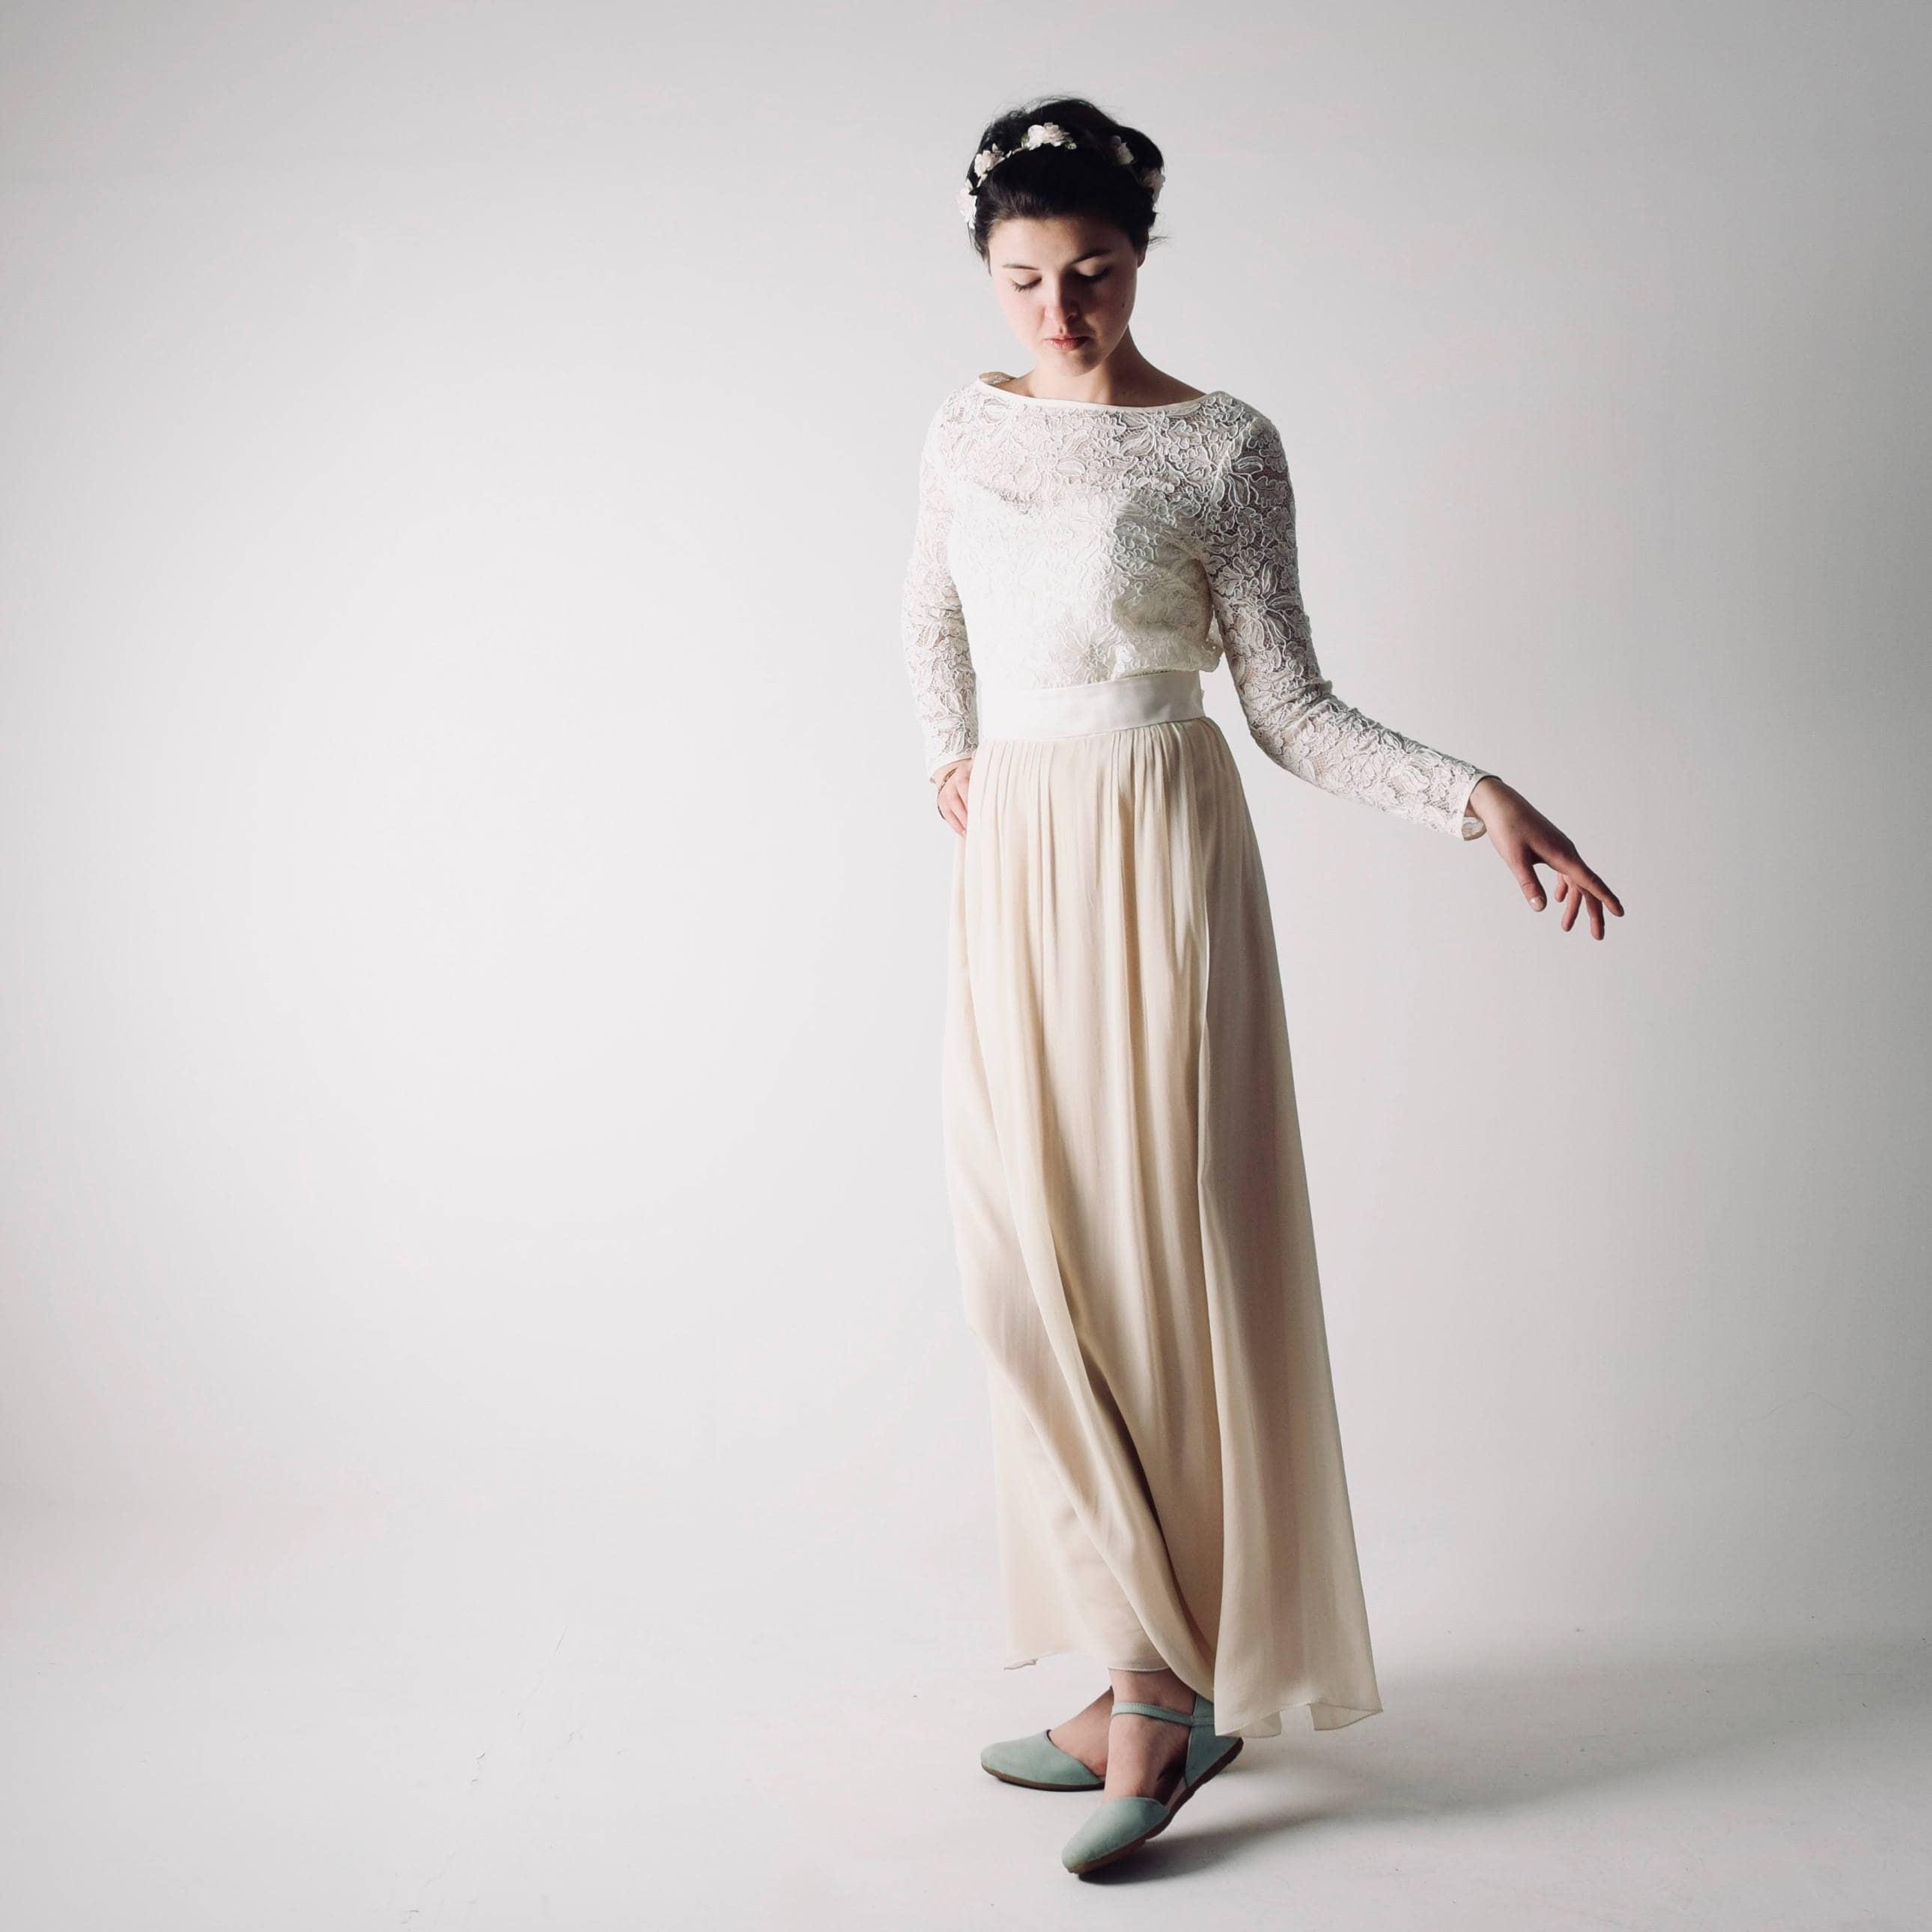 Simple Modest Wedding Dress 2015 Sweetheart Low Back: Long Sleeve Modest Wedding Dress